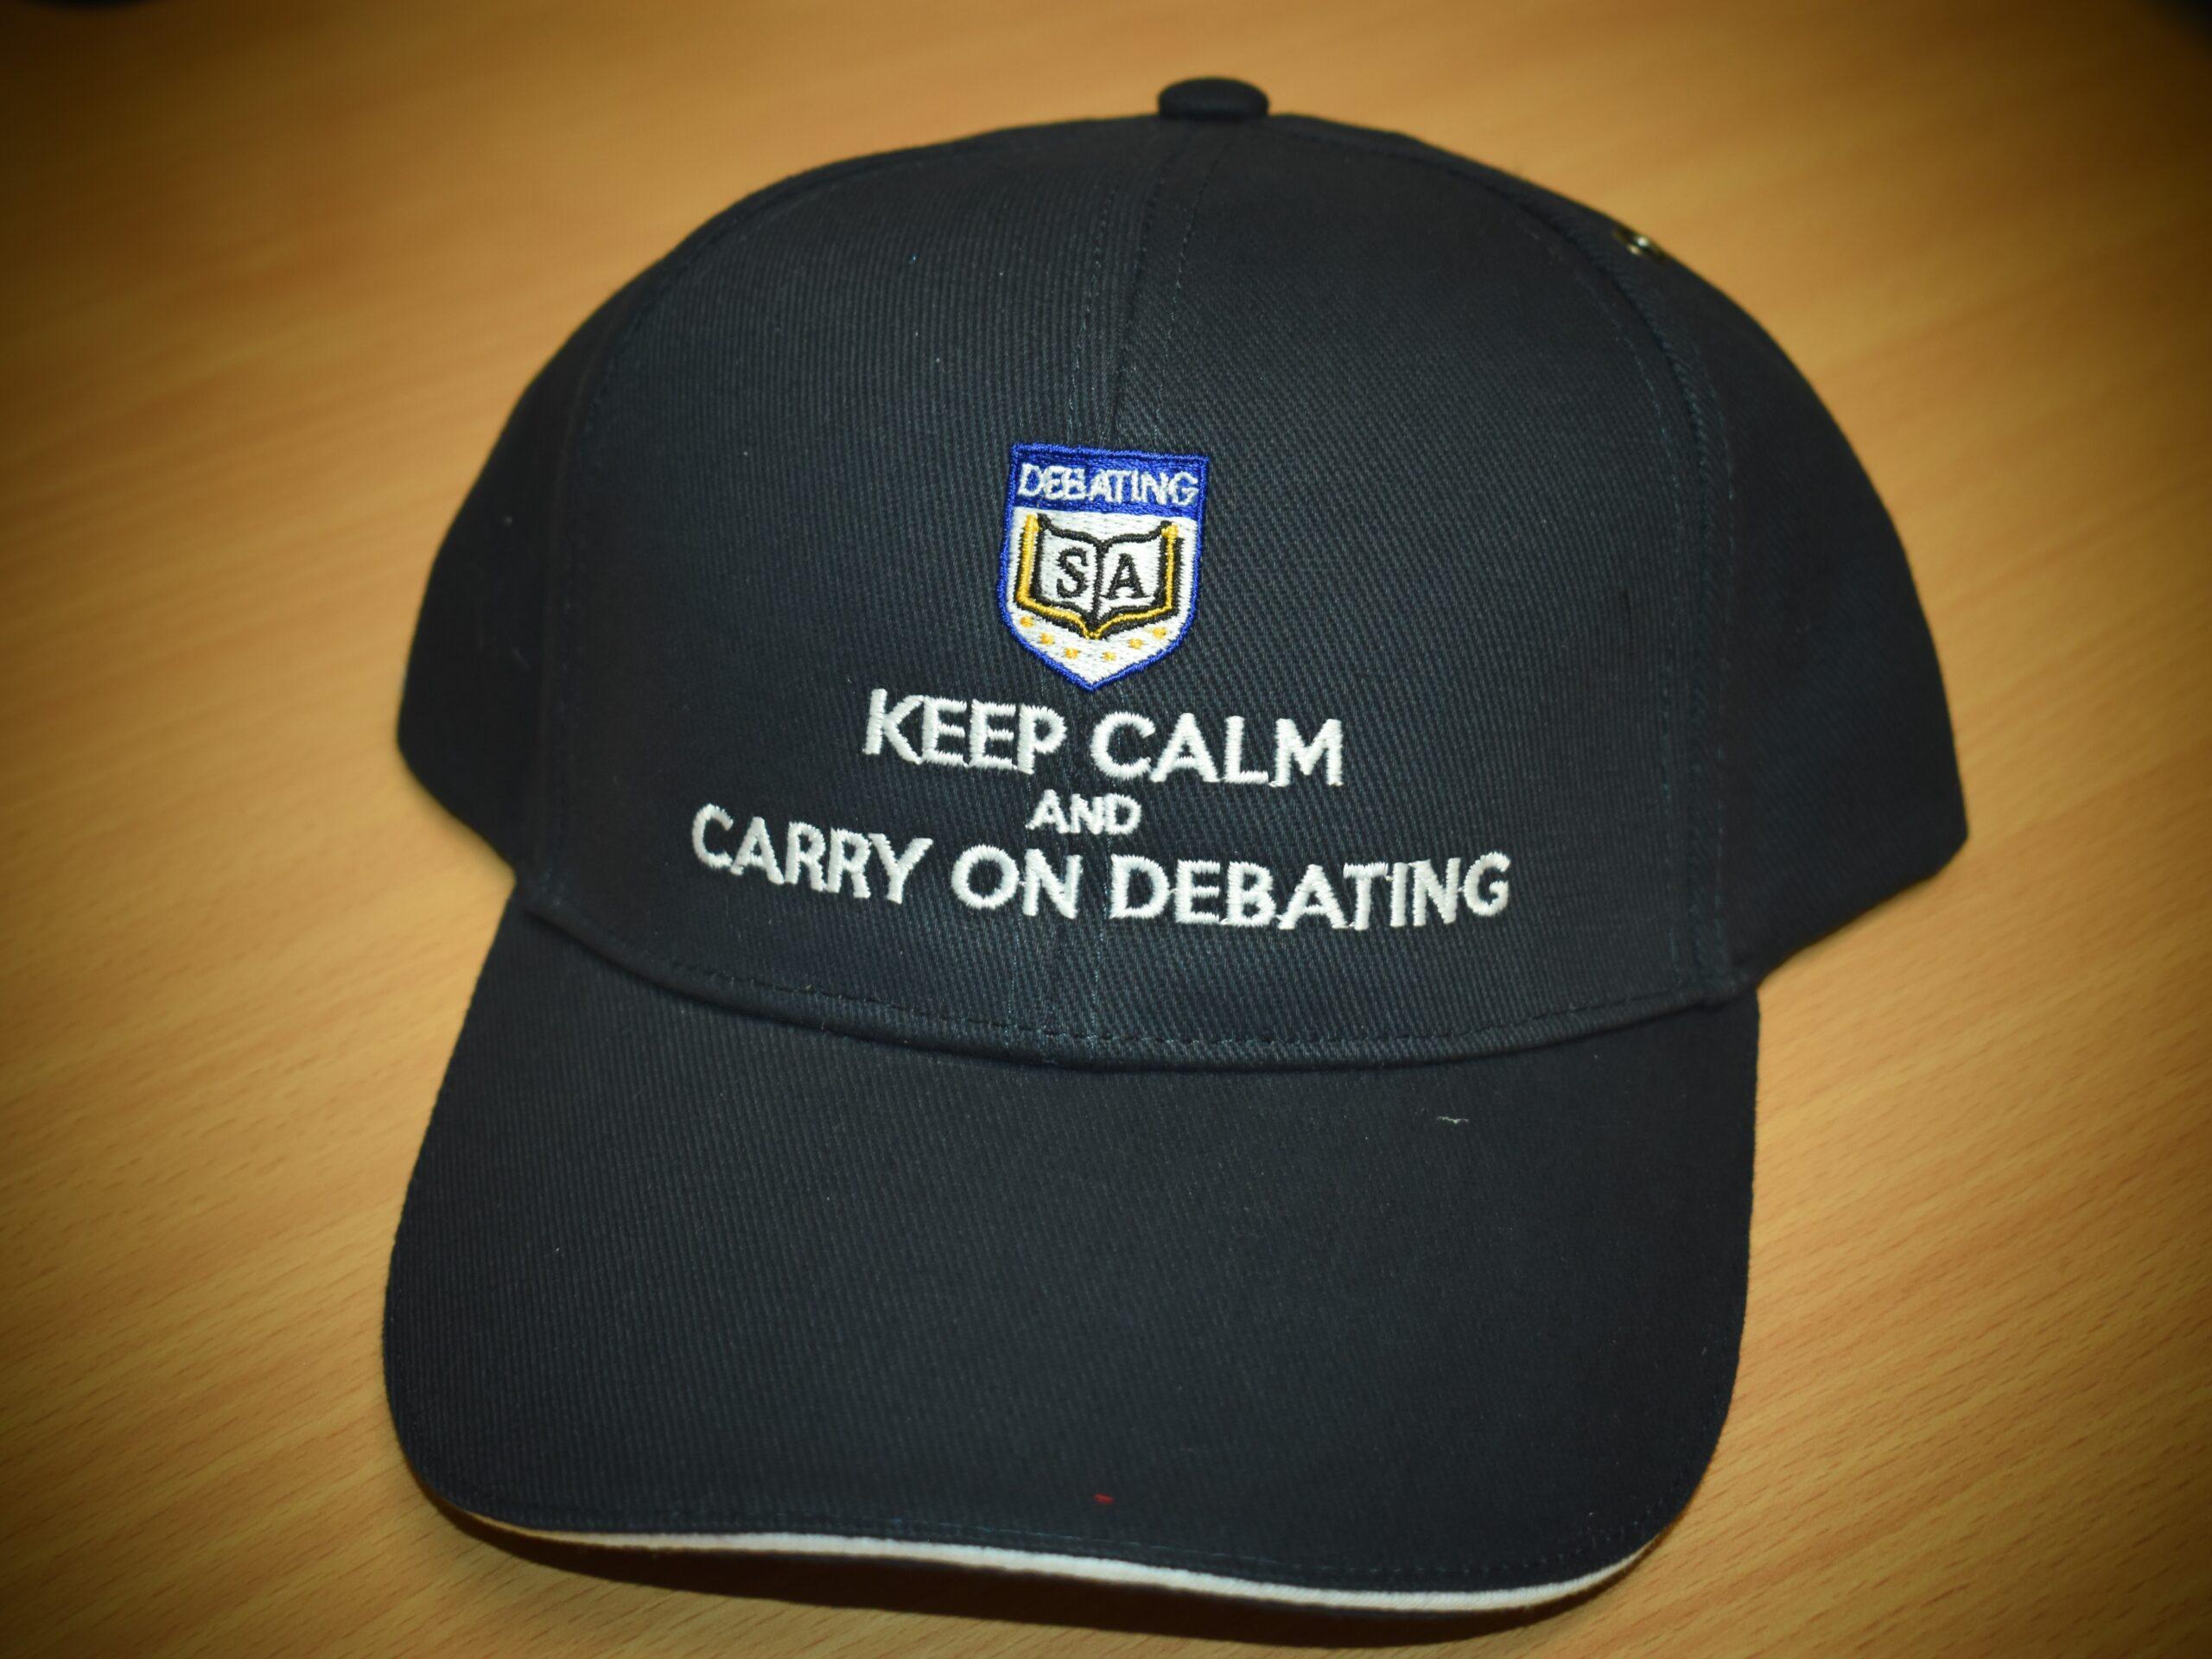 Debating SA Caps: Keep Calm and Carry on Debating